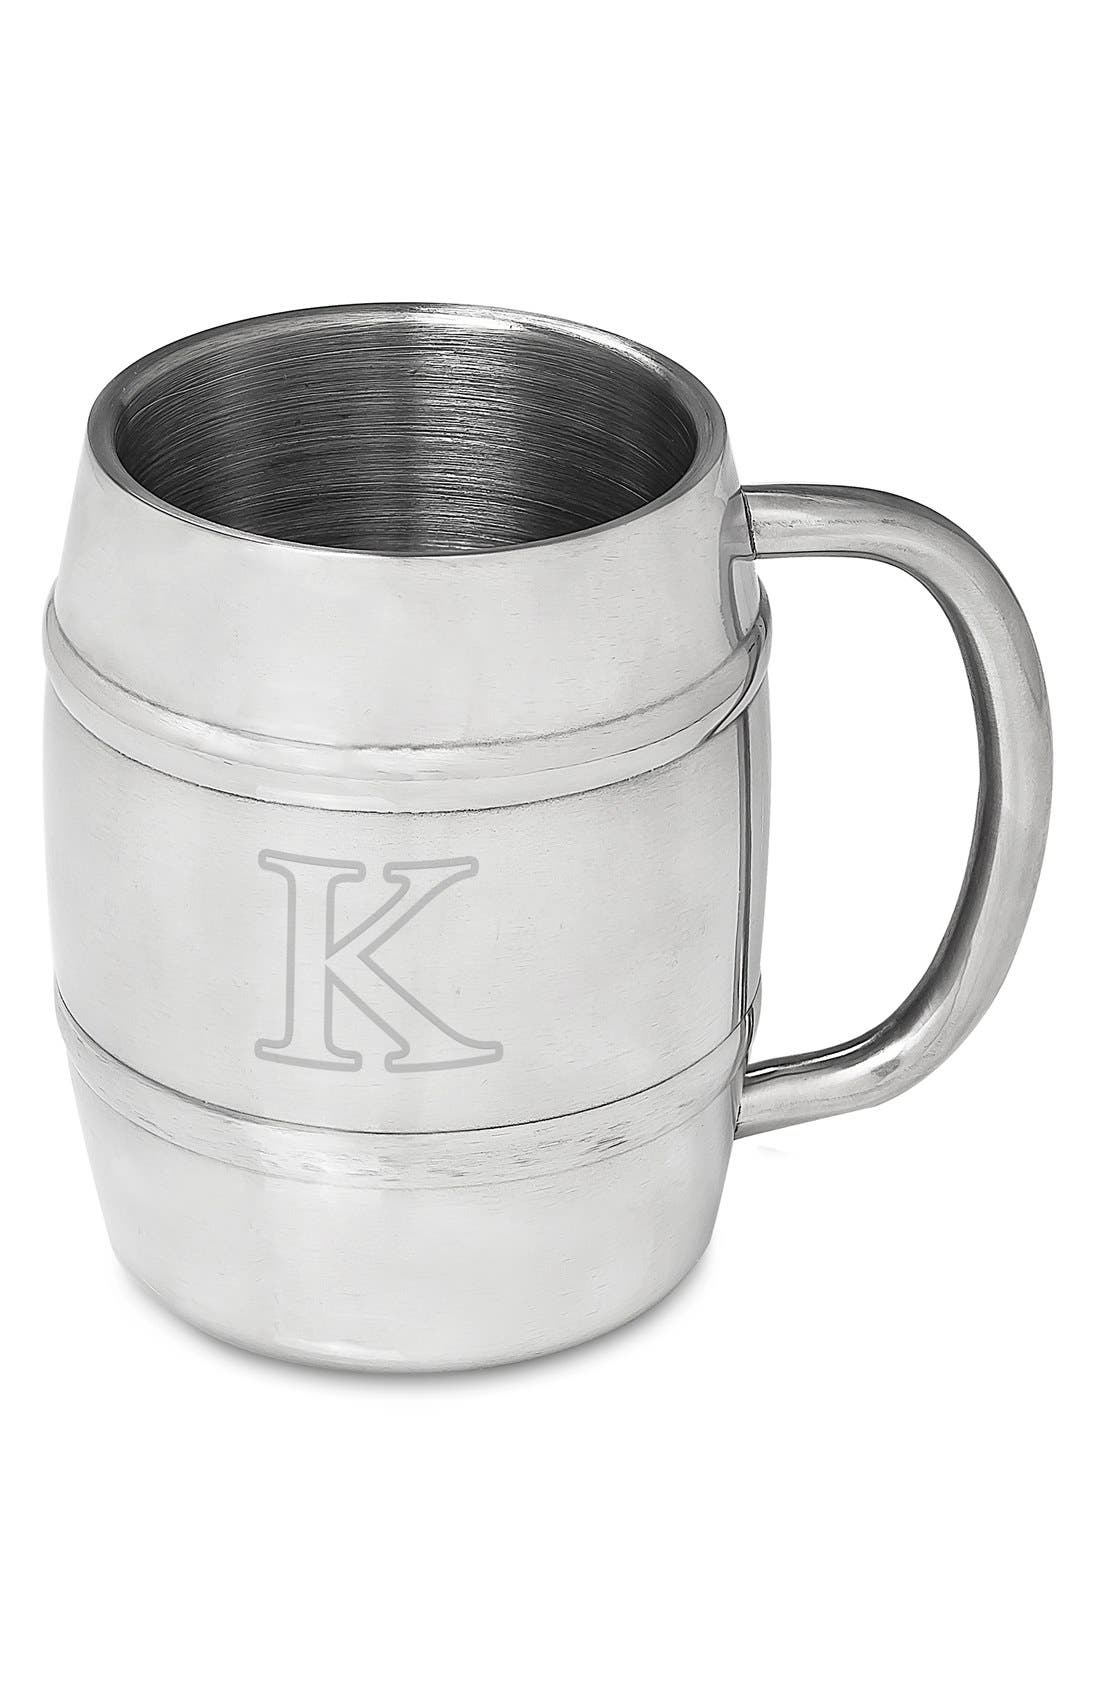 Monogram Stainless Steel Keg Mug,                             Main thumbnail 13, color,